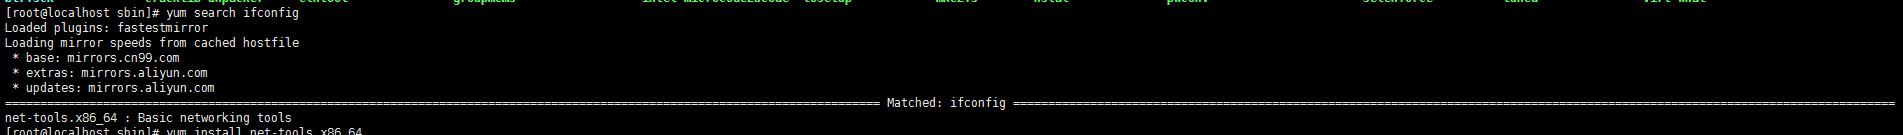 Centos 7 如何快速安装ifconfig命令